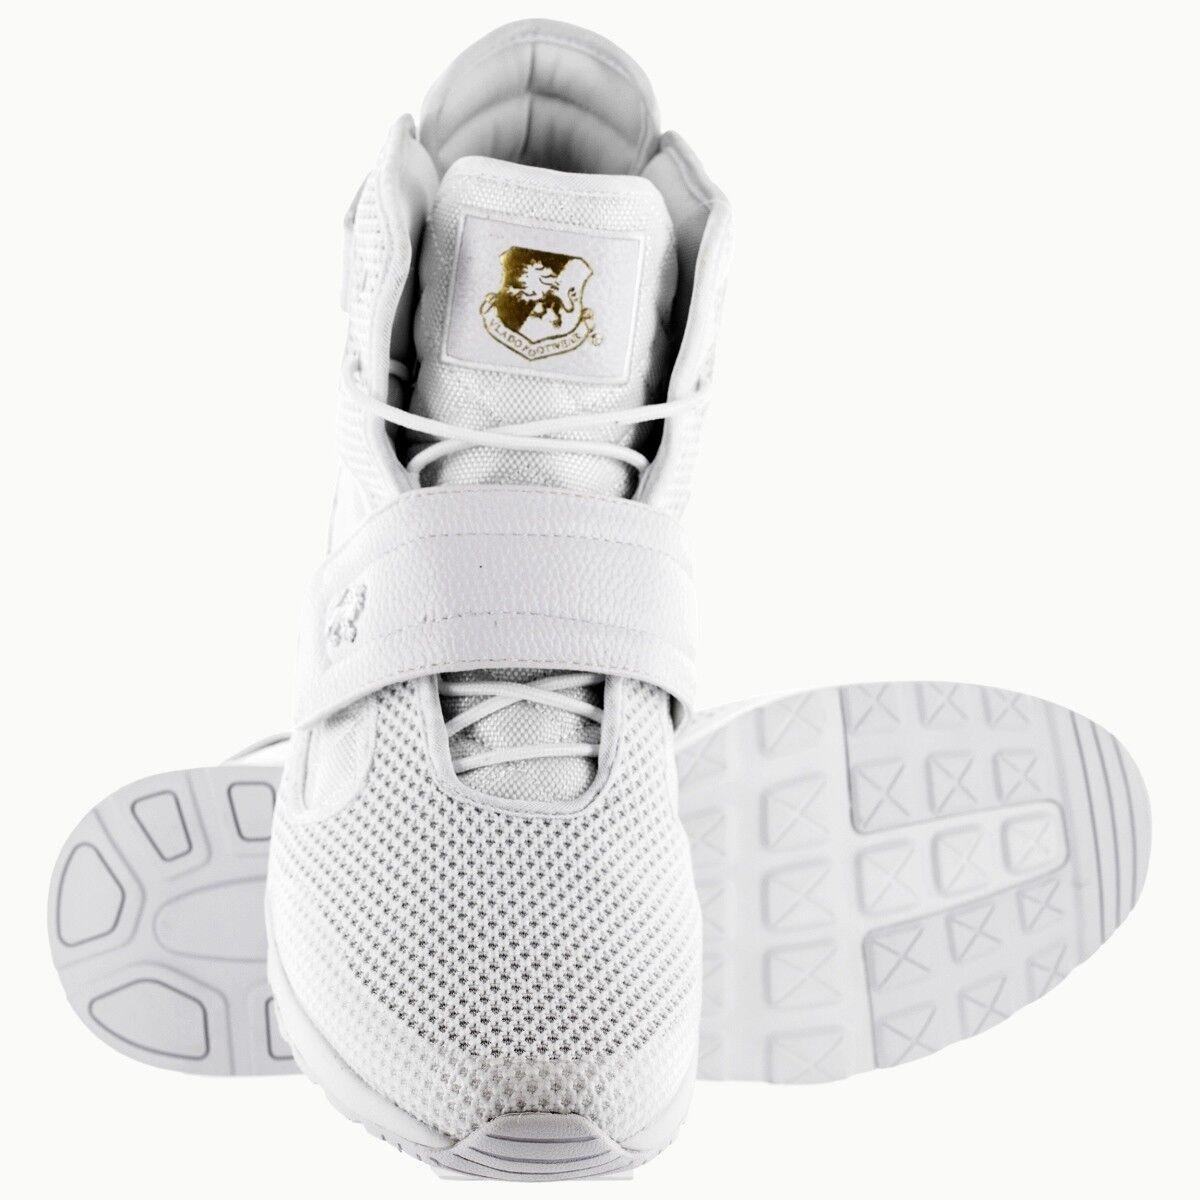 Vlado Homme Footwear Atlas III 3 Mono blanc Hi-top chaussures IG-1511-1W